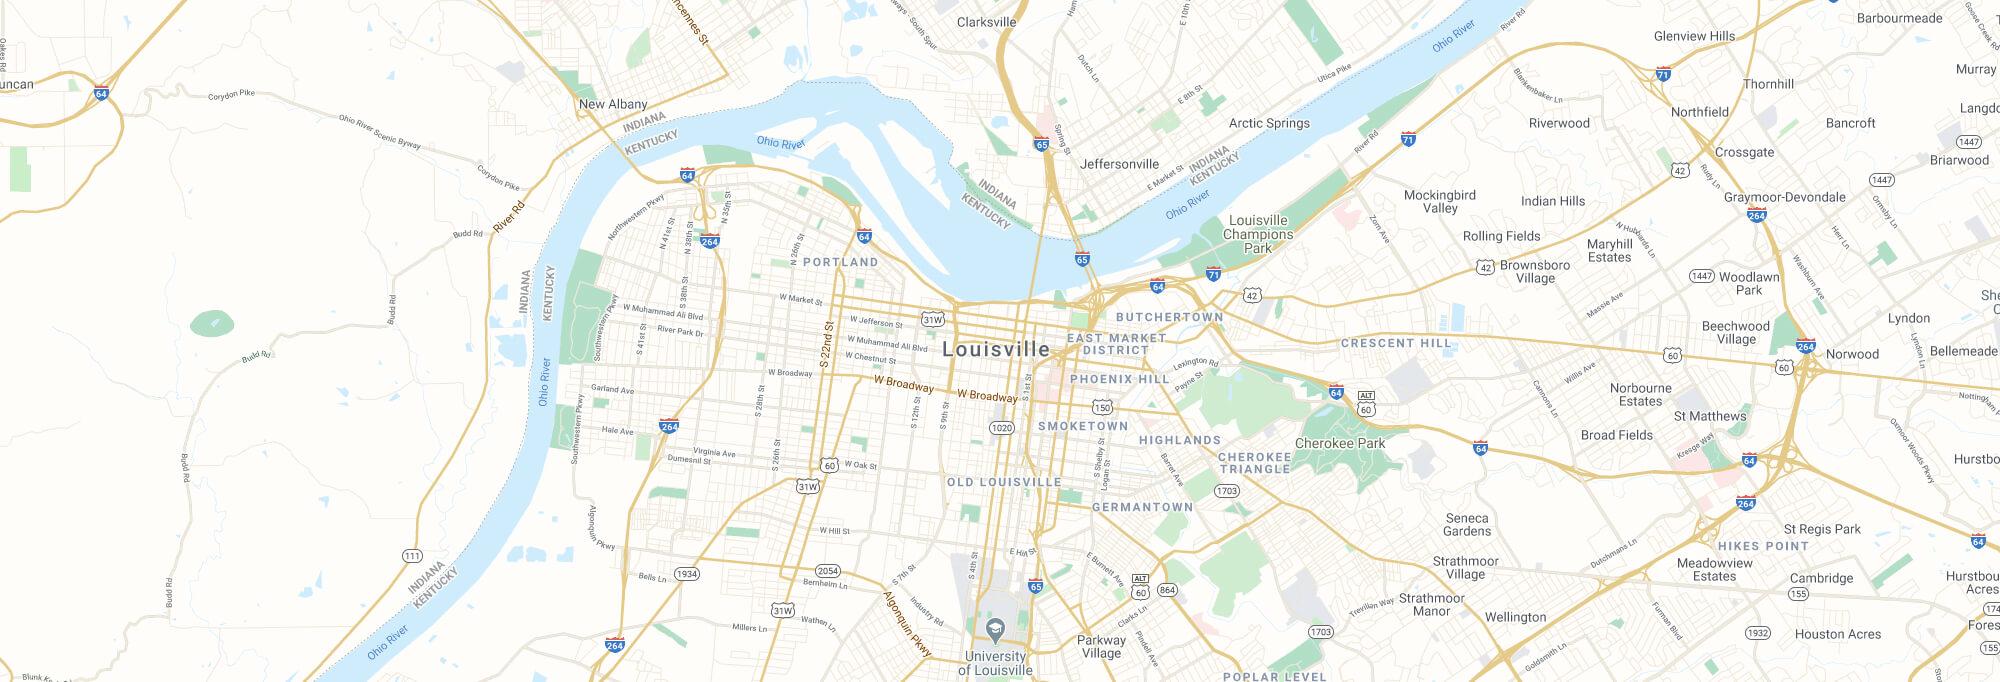 Louisville city map